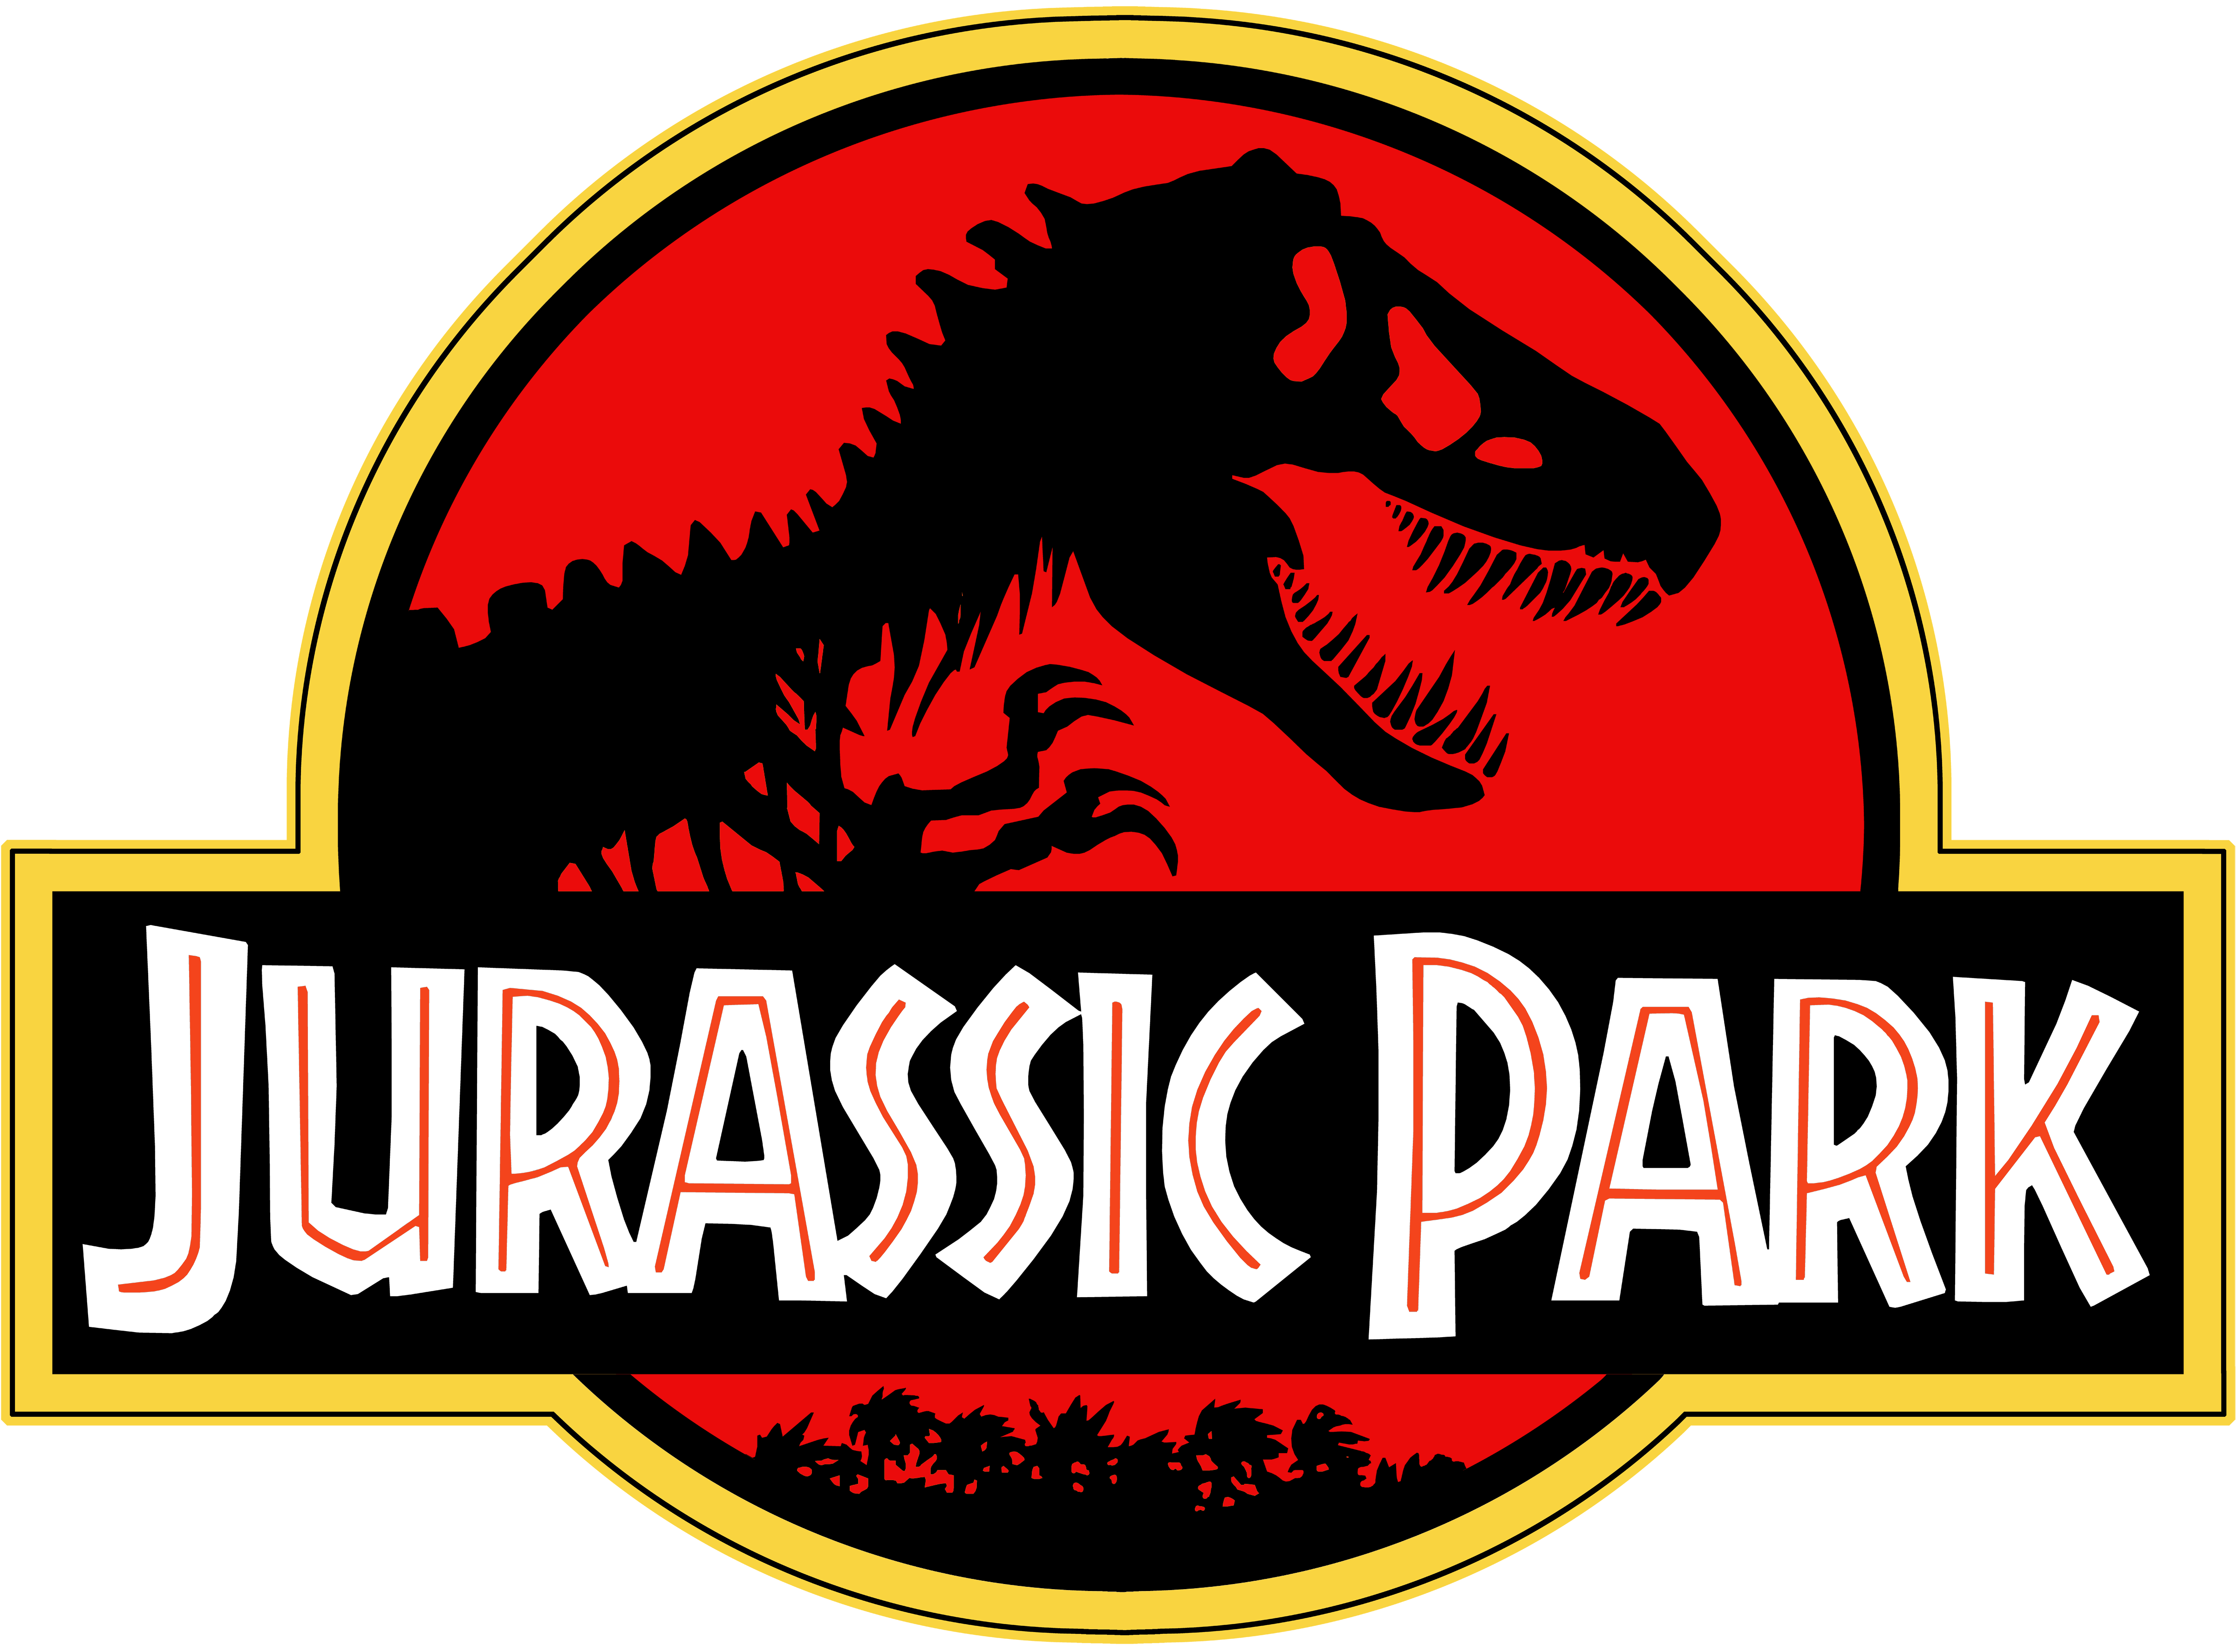 Jurassic Park PNG